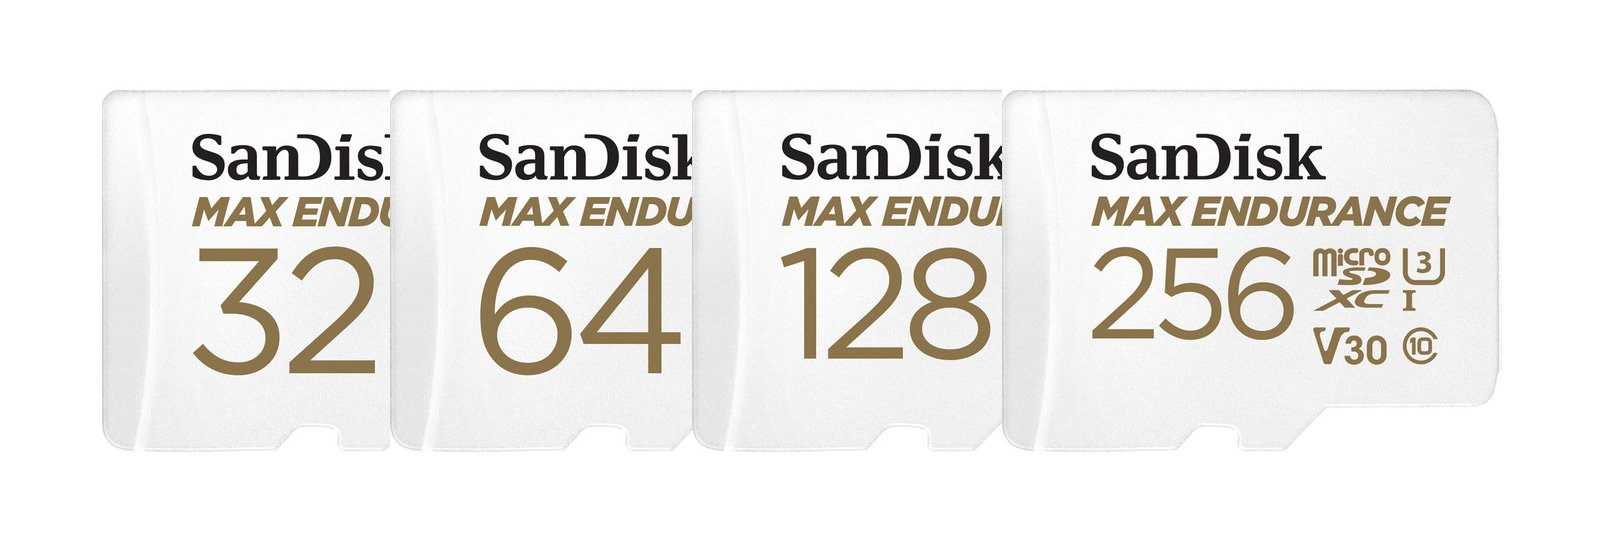 SanDisk MicroSDHC Card MAX ENDURANCE 32GB (SDSQQVR-032G-GN6IA) Whtie